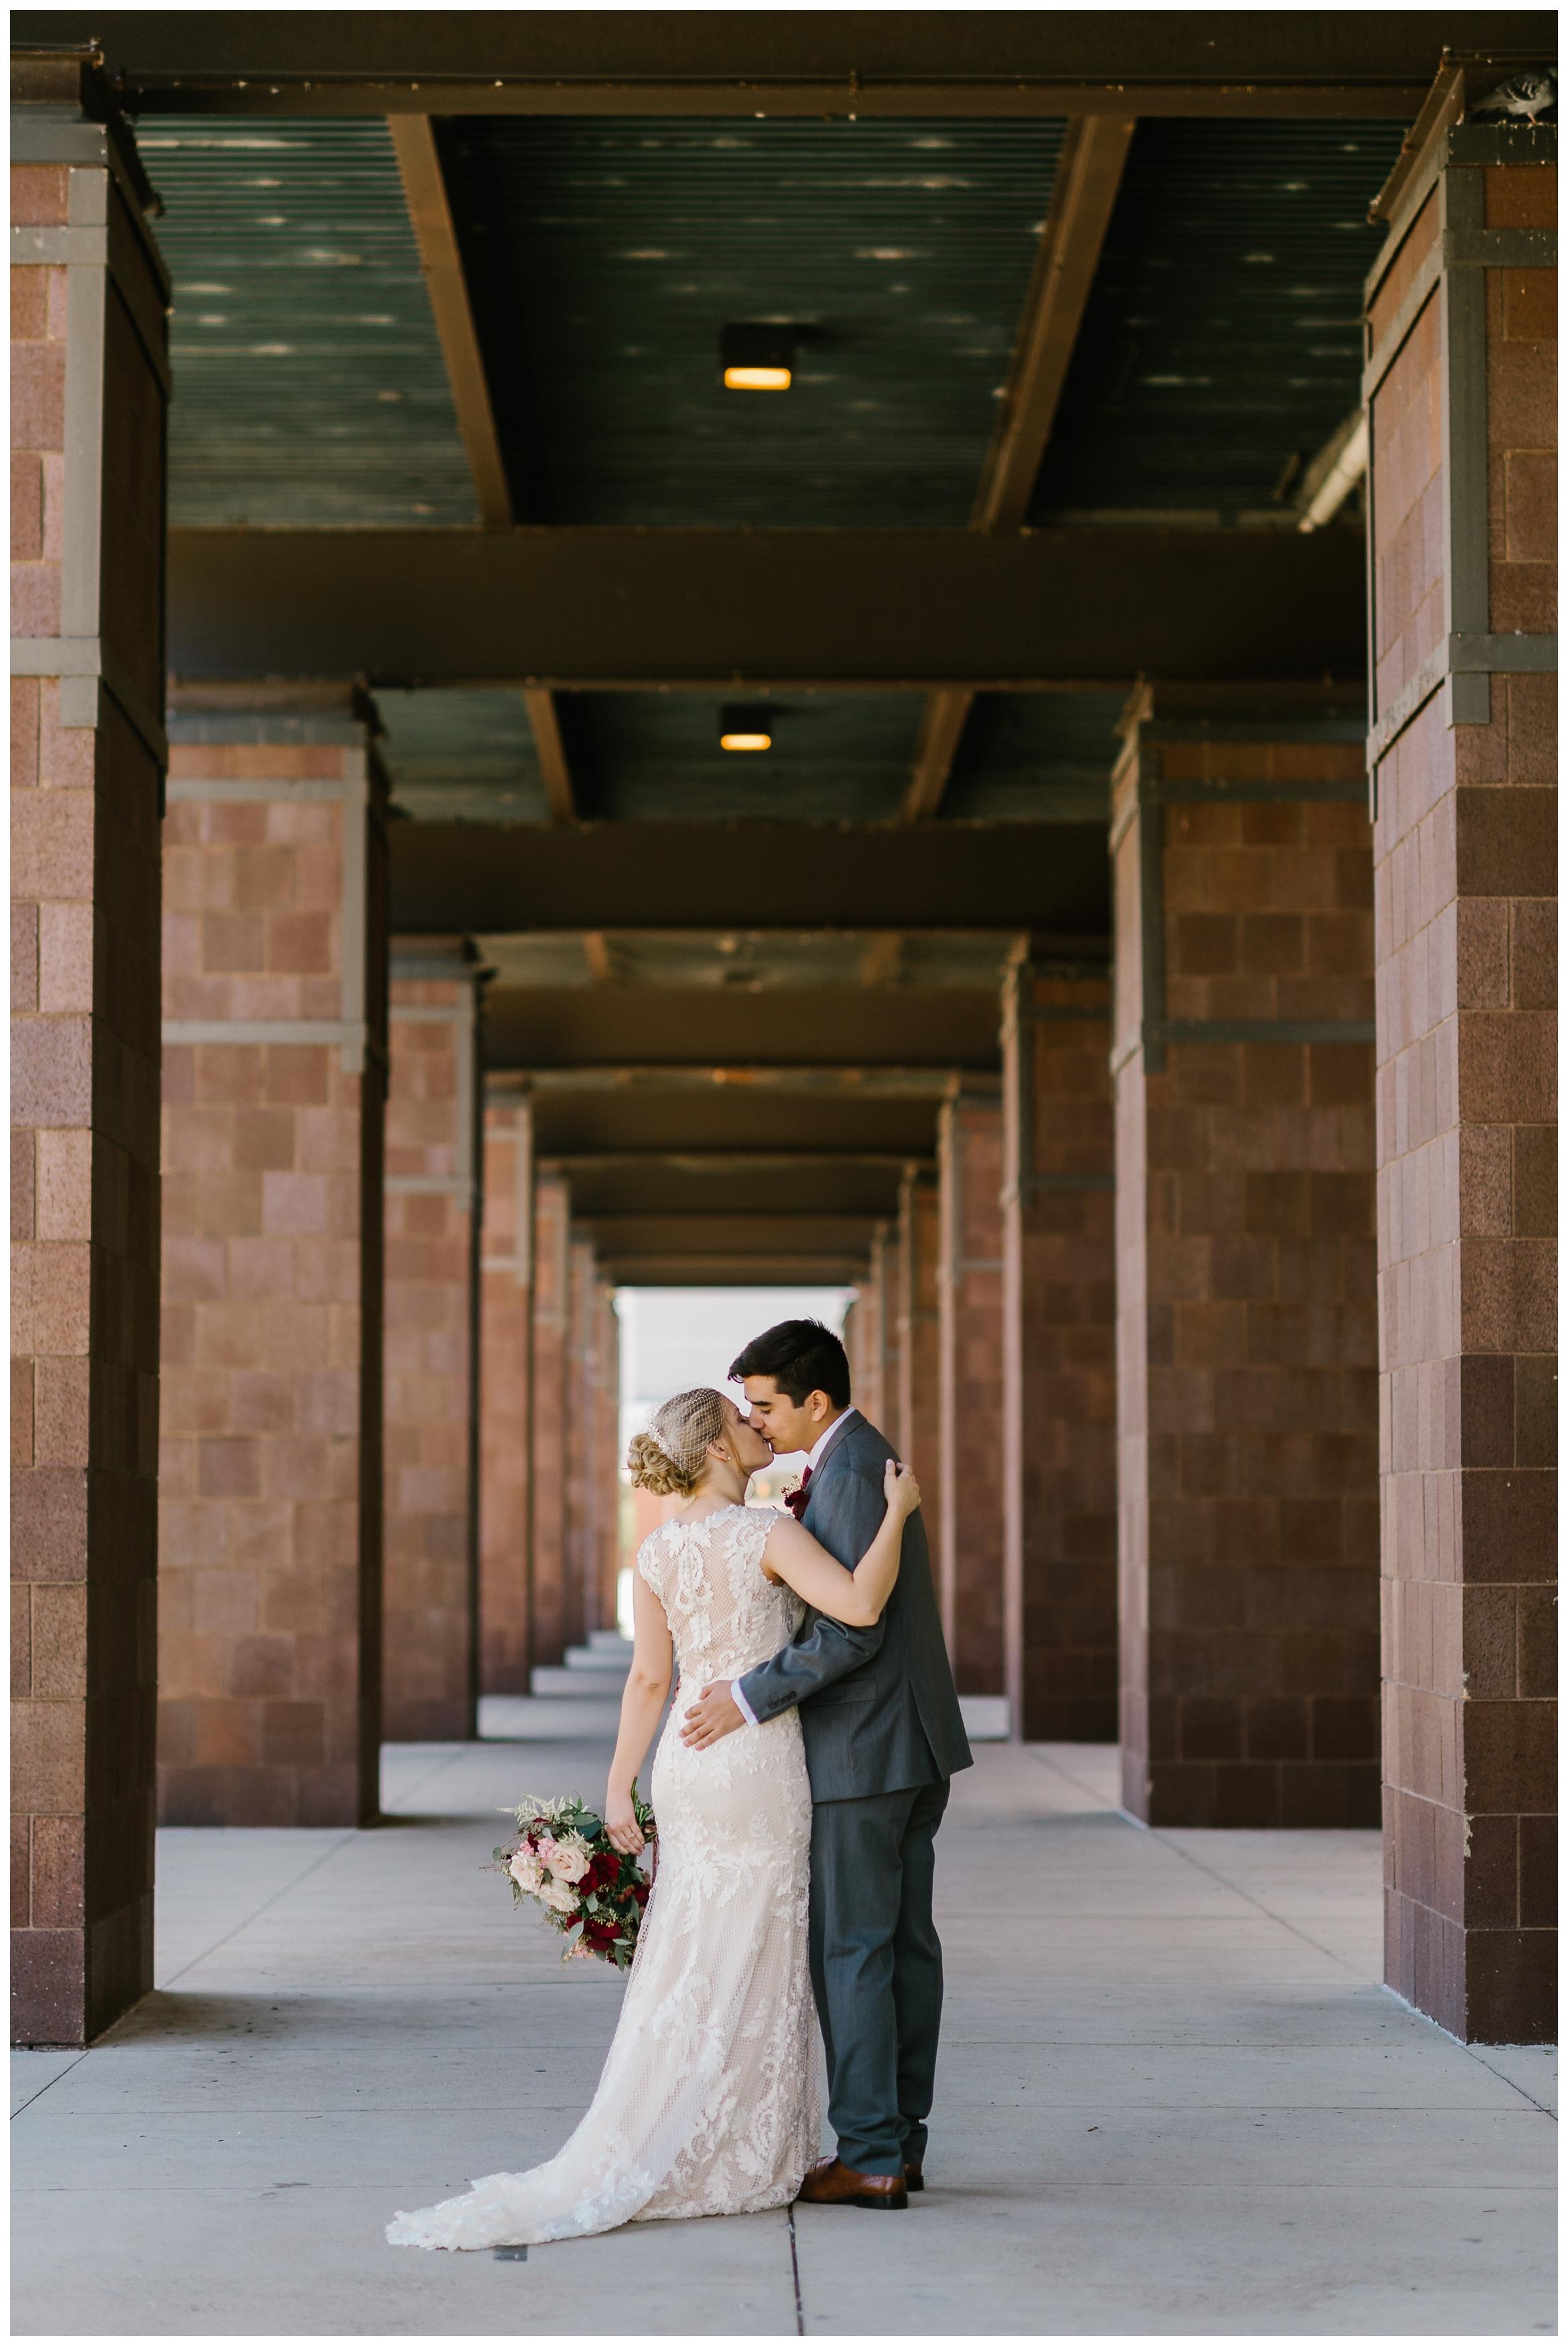 Rebecca_Shehorn_Photography_Indianapolis_Wedding_Photographer_7339.jpg